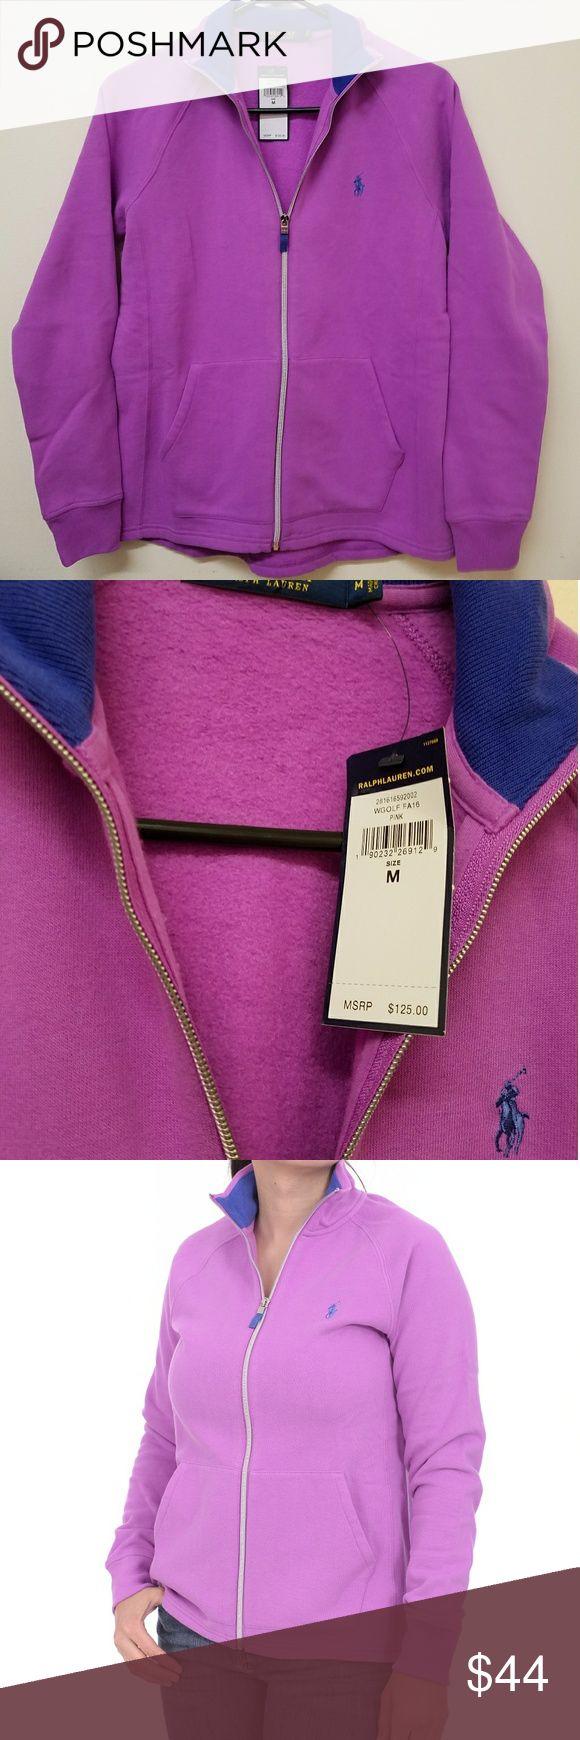 Ralph Lauren Polo Golf Women's Zip Up Sweater Women's Polo Golf Ralph Lauren Zip Up Sweater Fleece with Front Pockets. Purple with Blue Pony Logo Ralph Lauren Sweaters